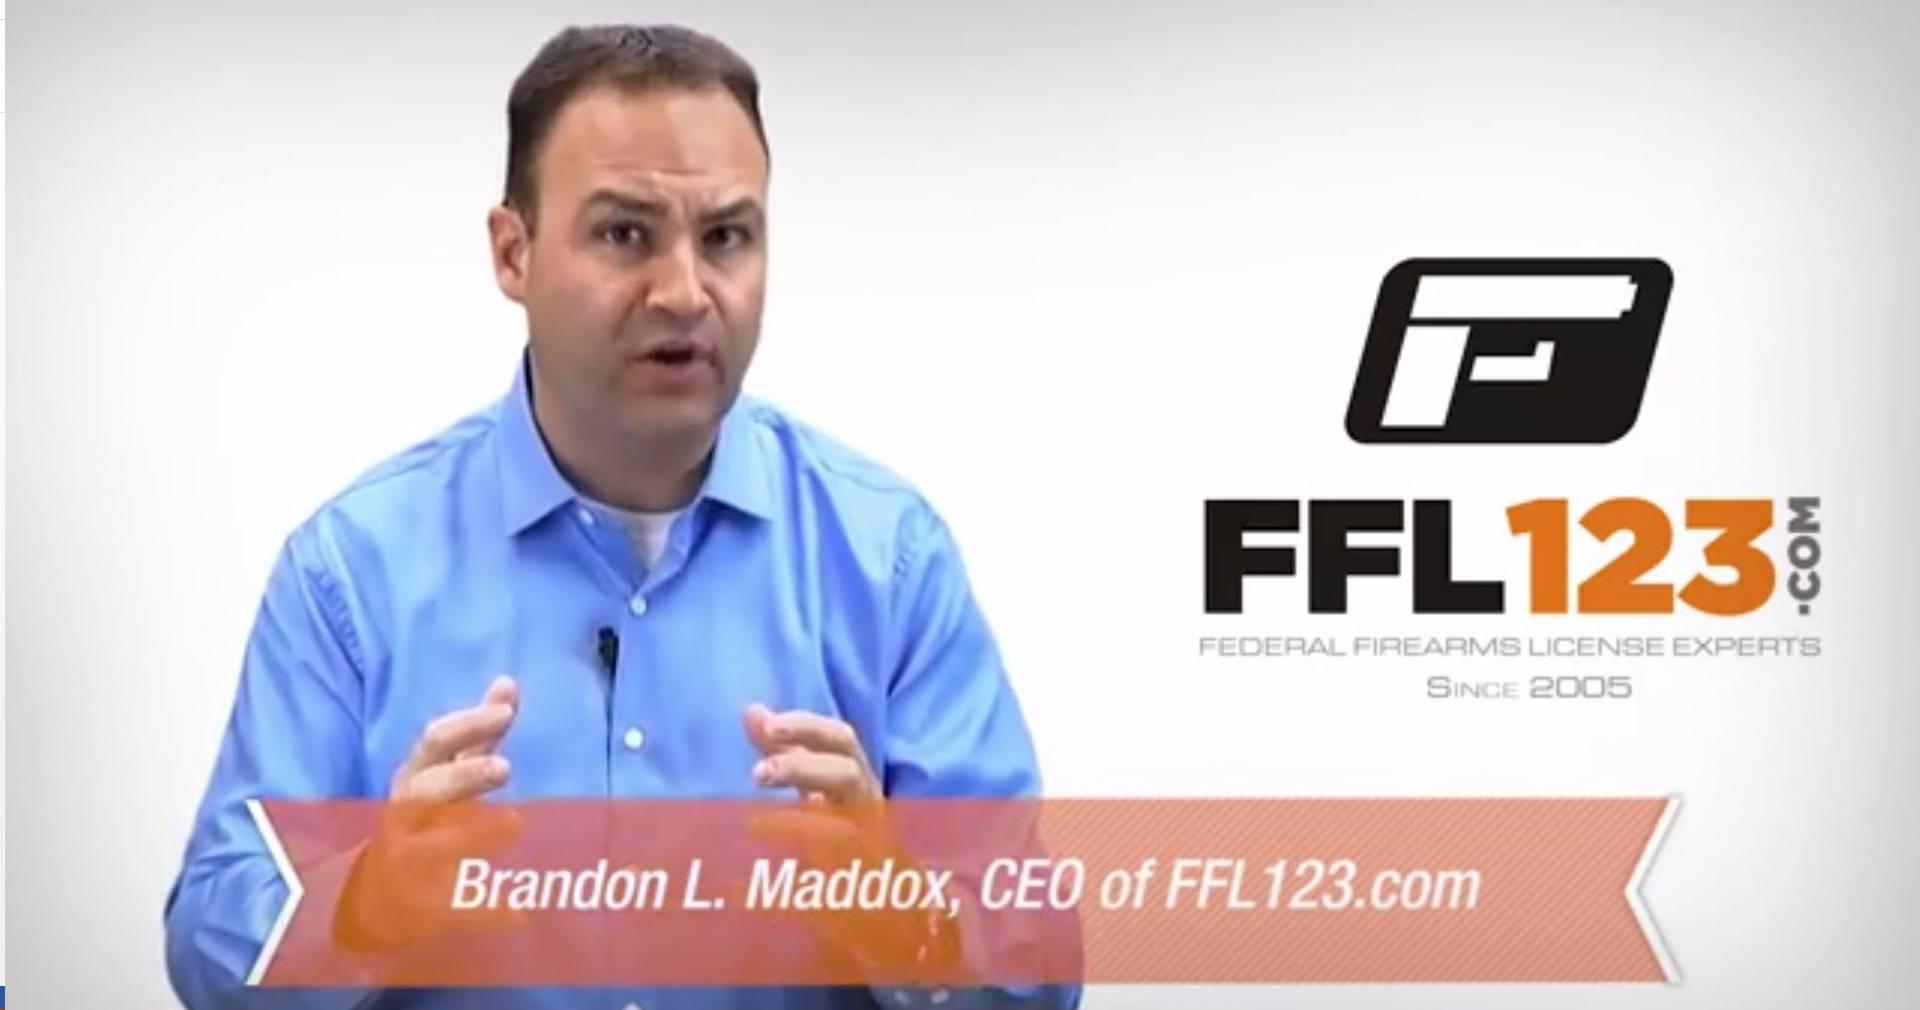 FFL123.com Videos